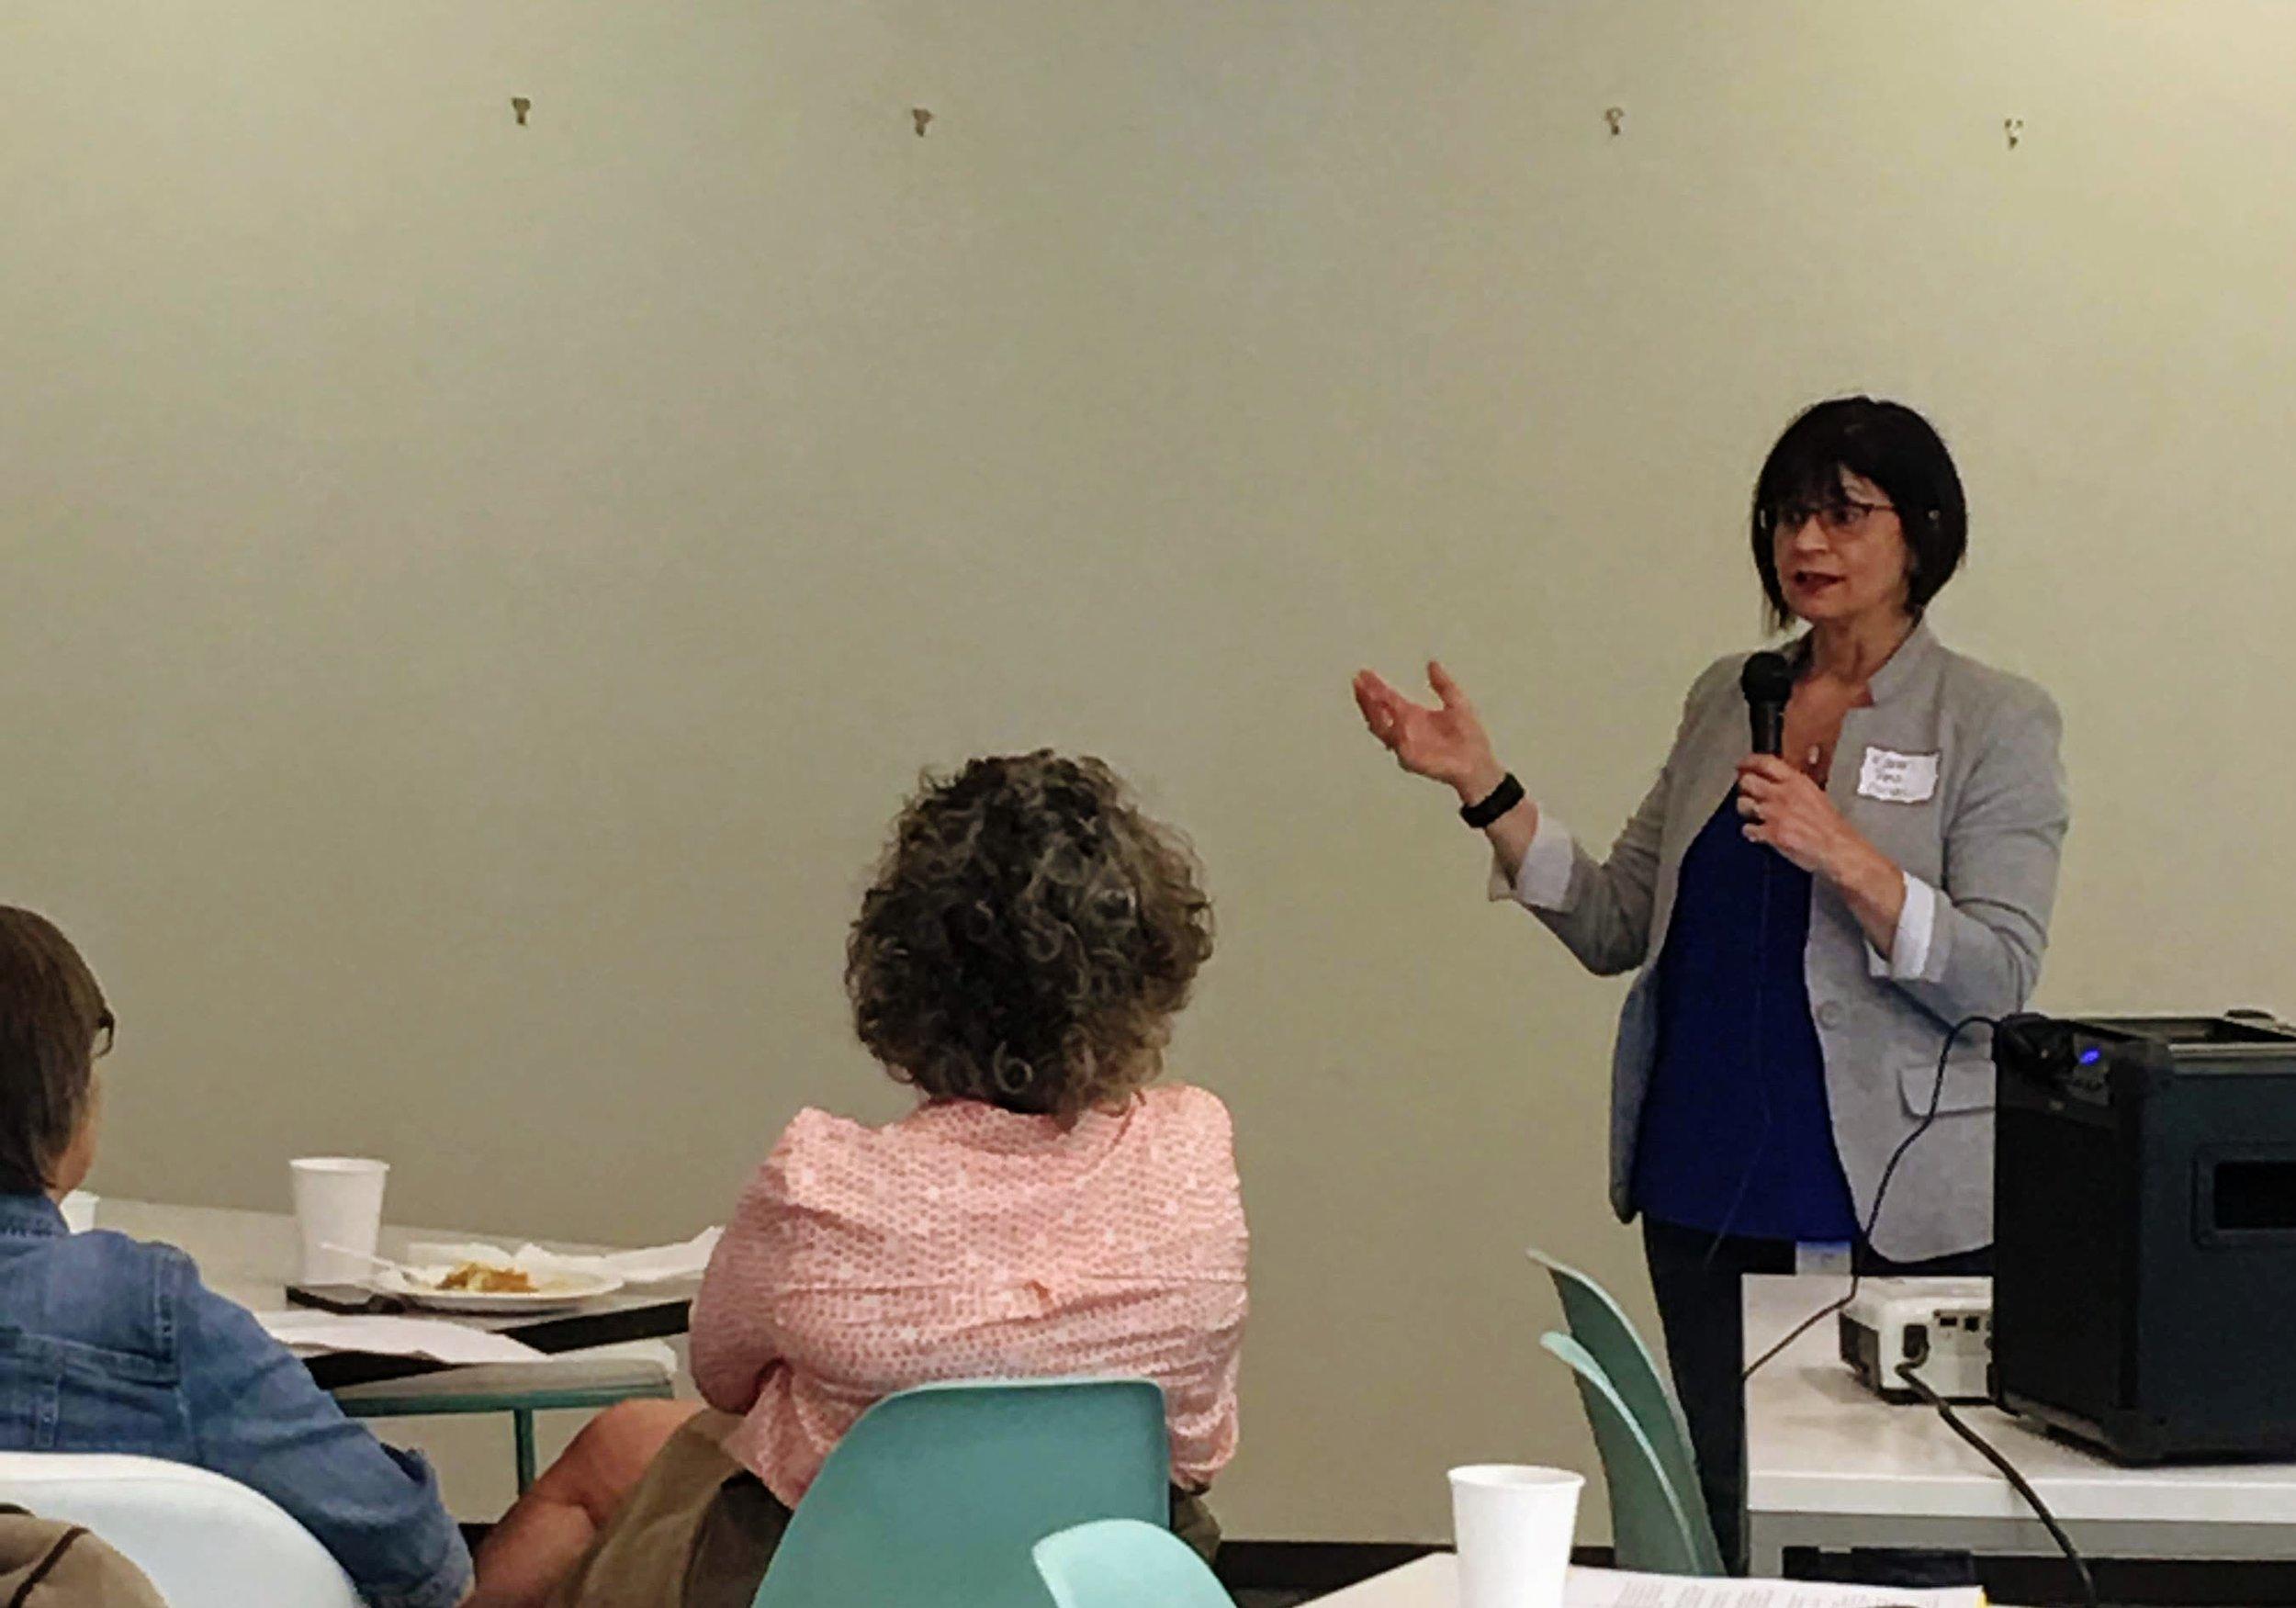 PDXWIT Experienced Women in Tech @ Corvel, 4/30/19 - Karen Pesznecker, Senior Talent Acquisition Specialist at CorVel, opens the presentation